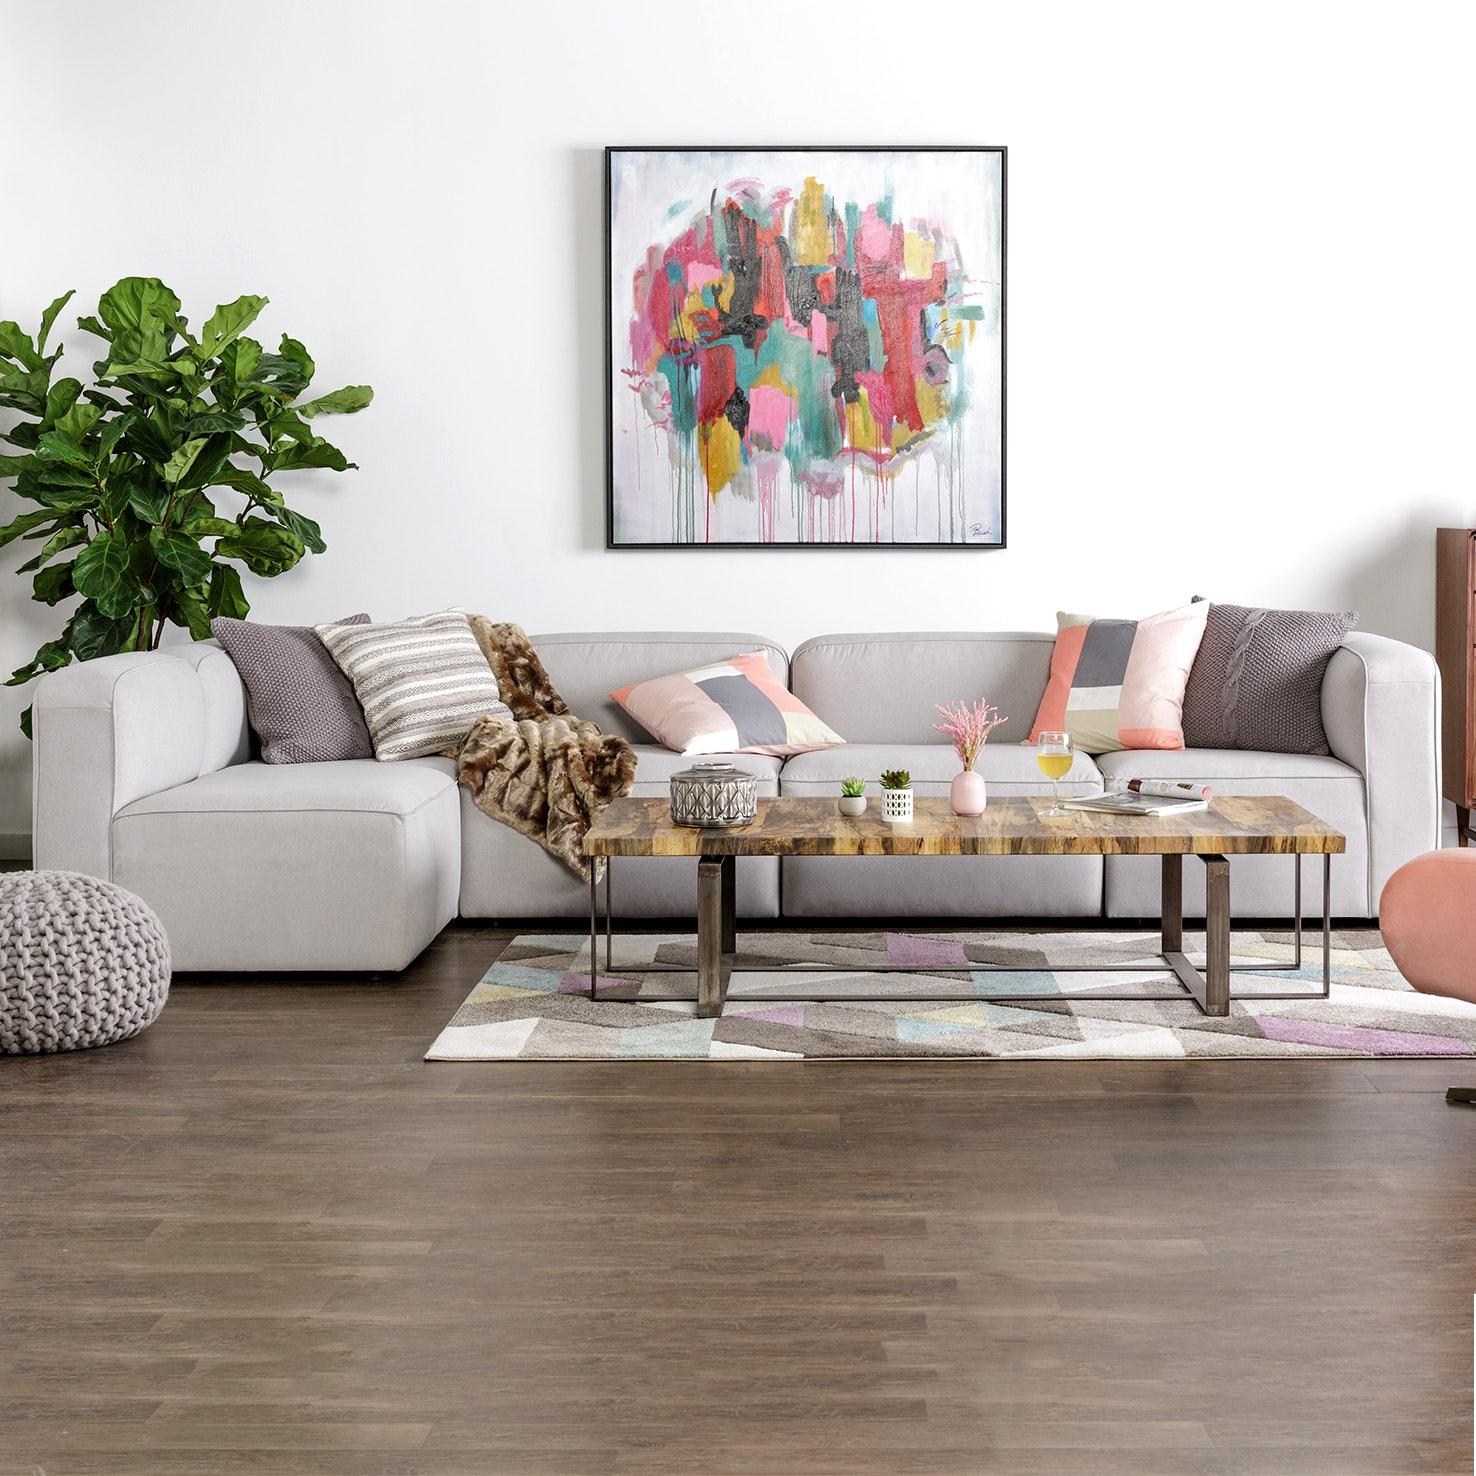 Modular Sofas, Sectionals, & Couches | Joybird